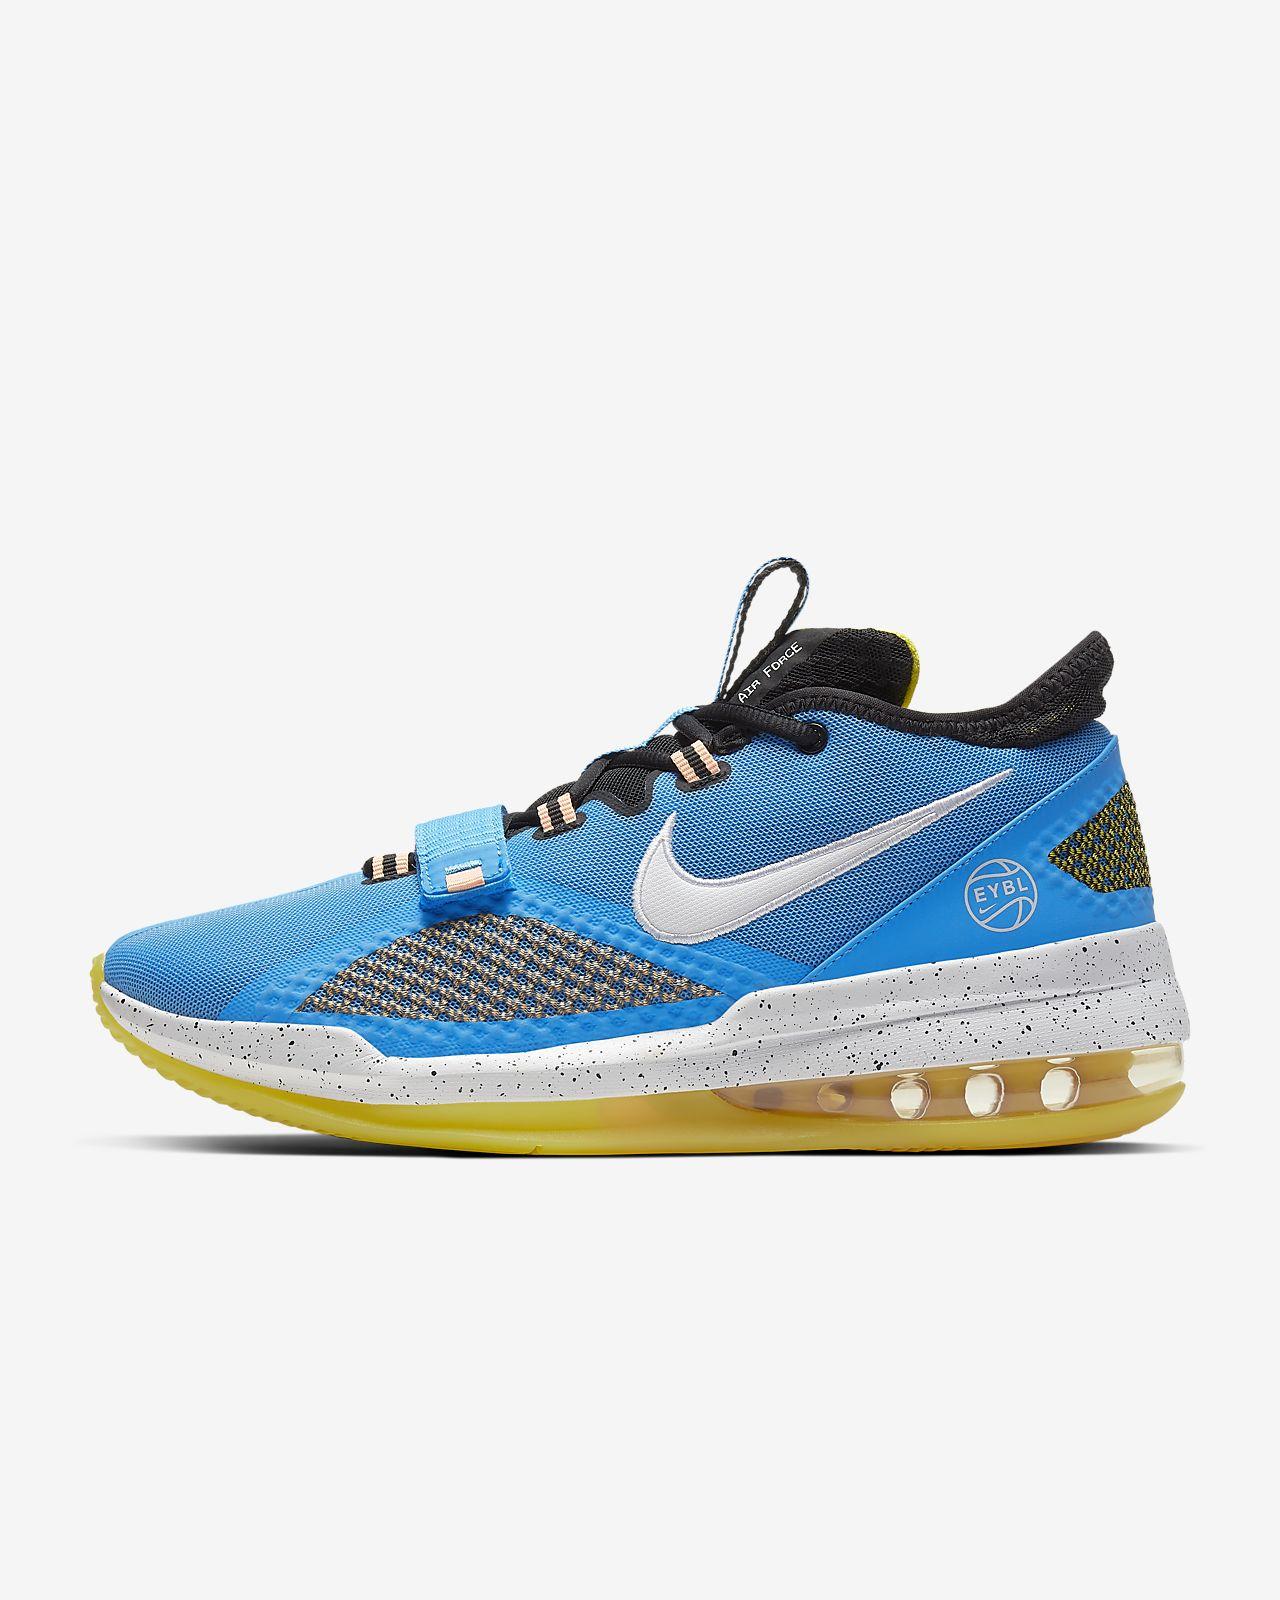 Nike Air Force Max Low EP 男子篮球鞋